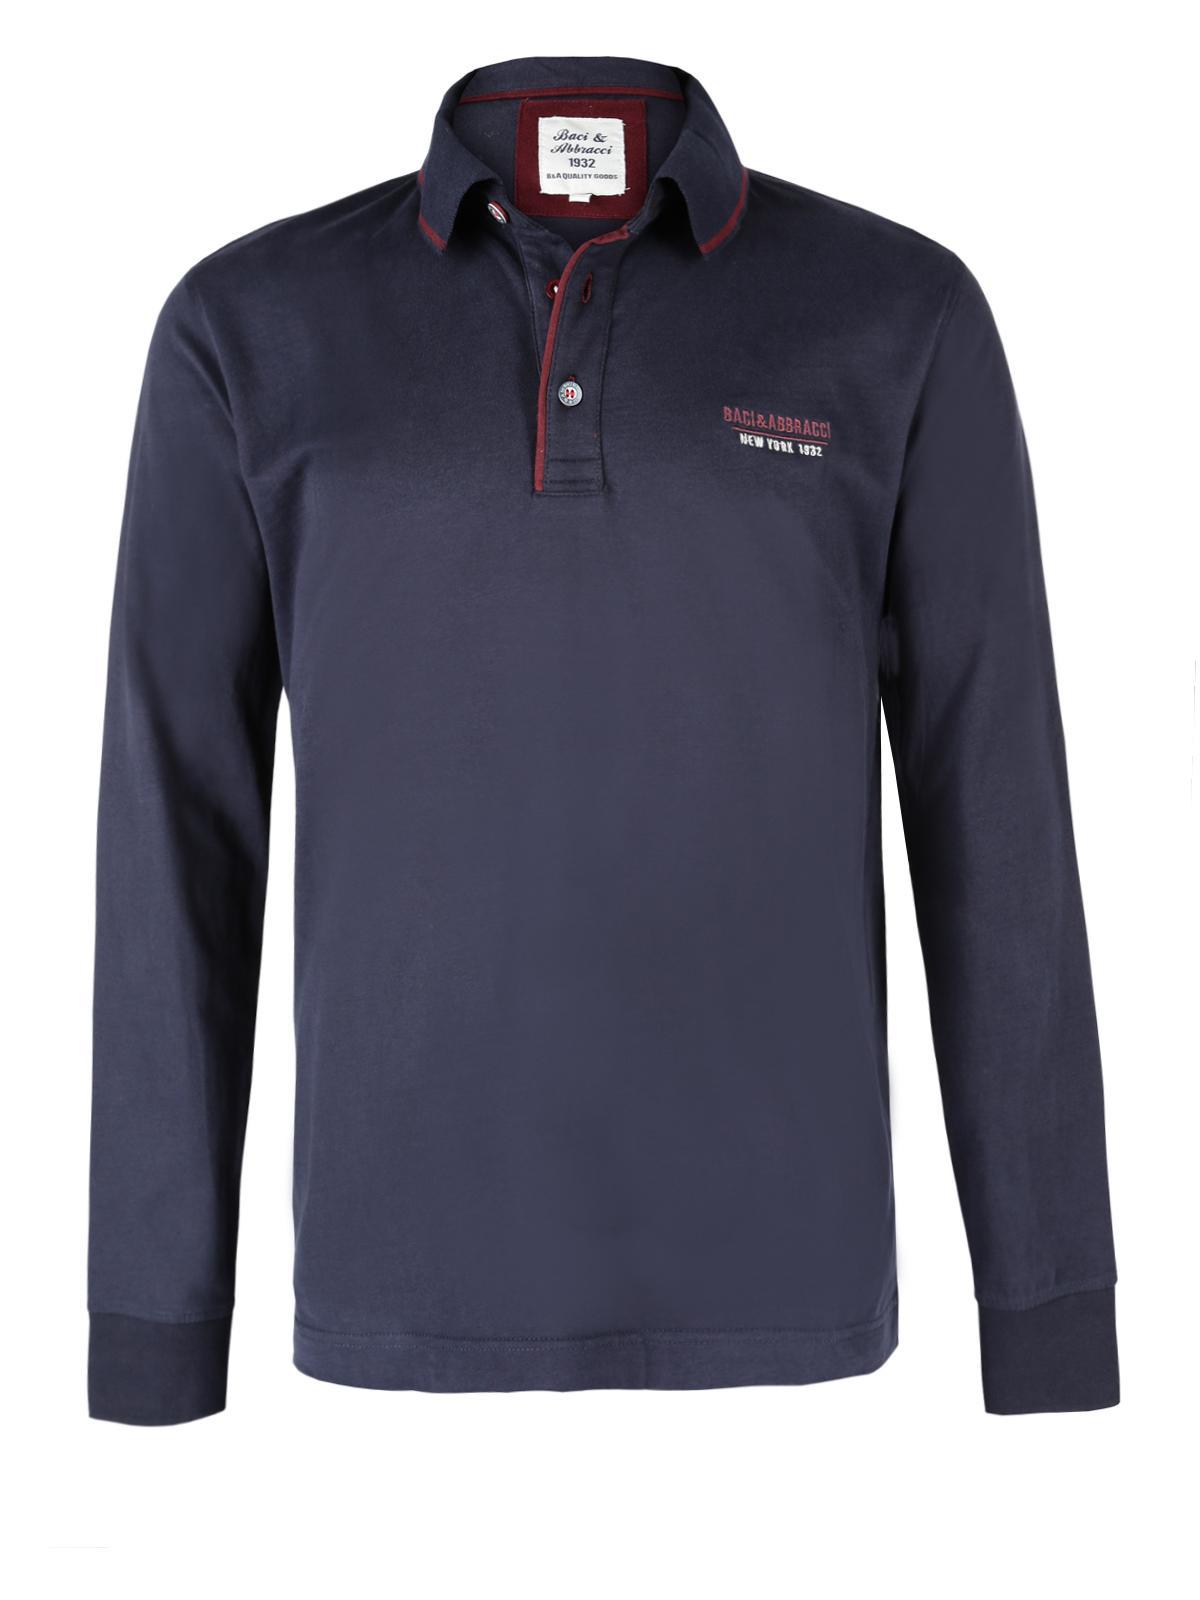 Abbracci ShirtMecshopping Men's Cotton Baciamp; Polo 0kN8OPXnw